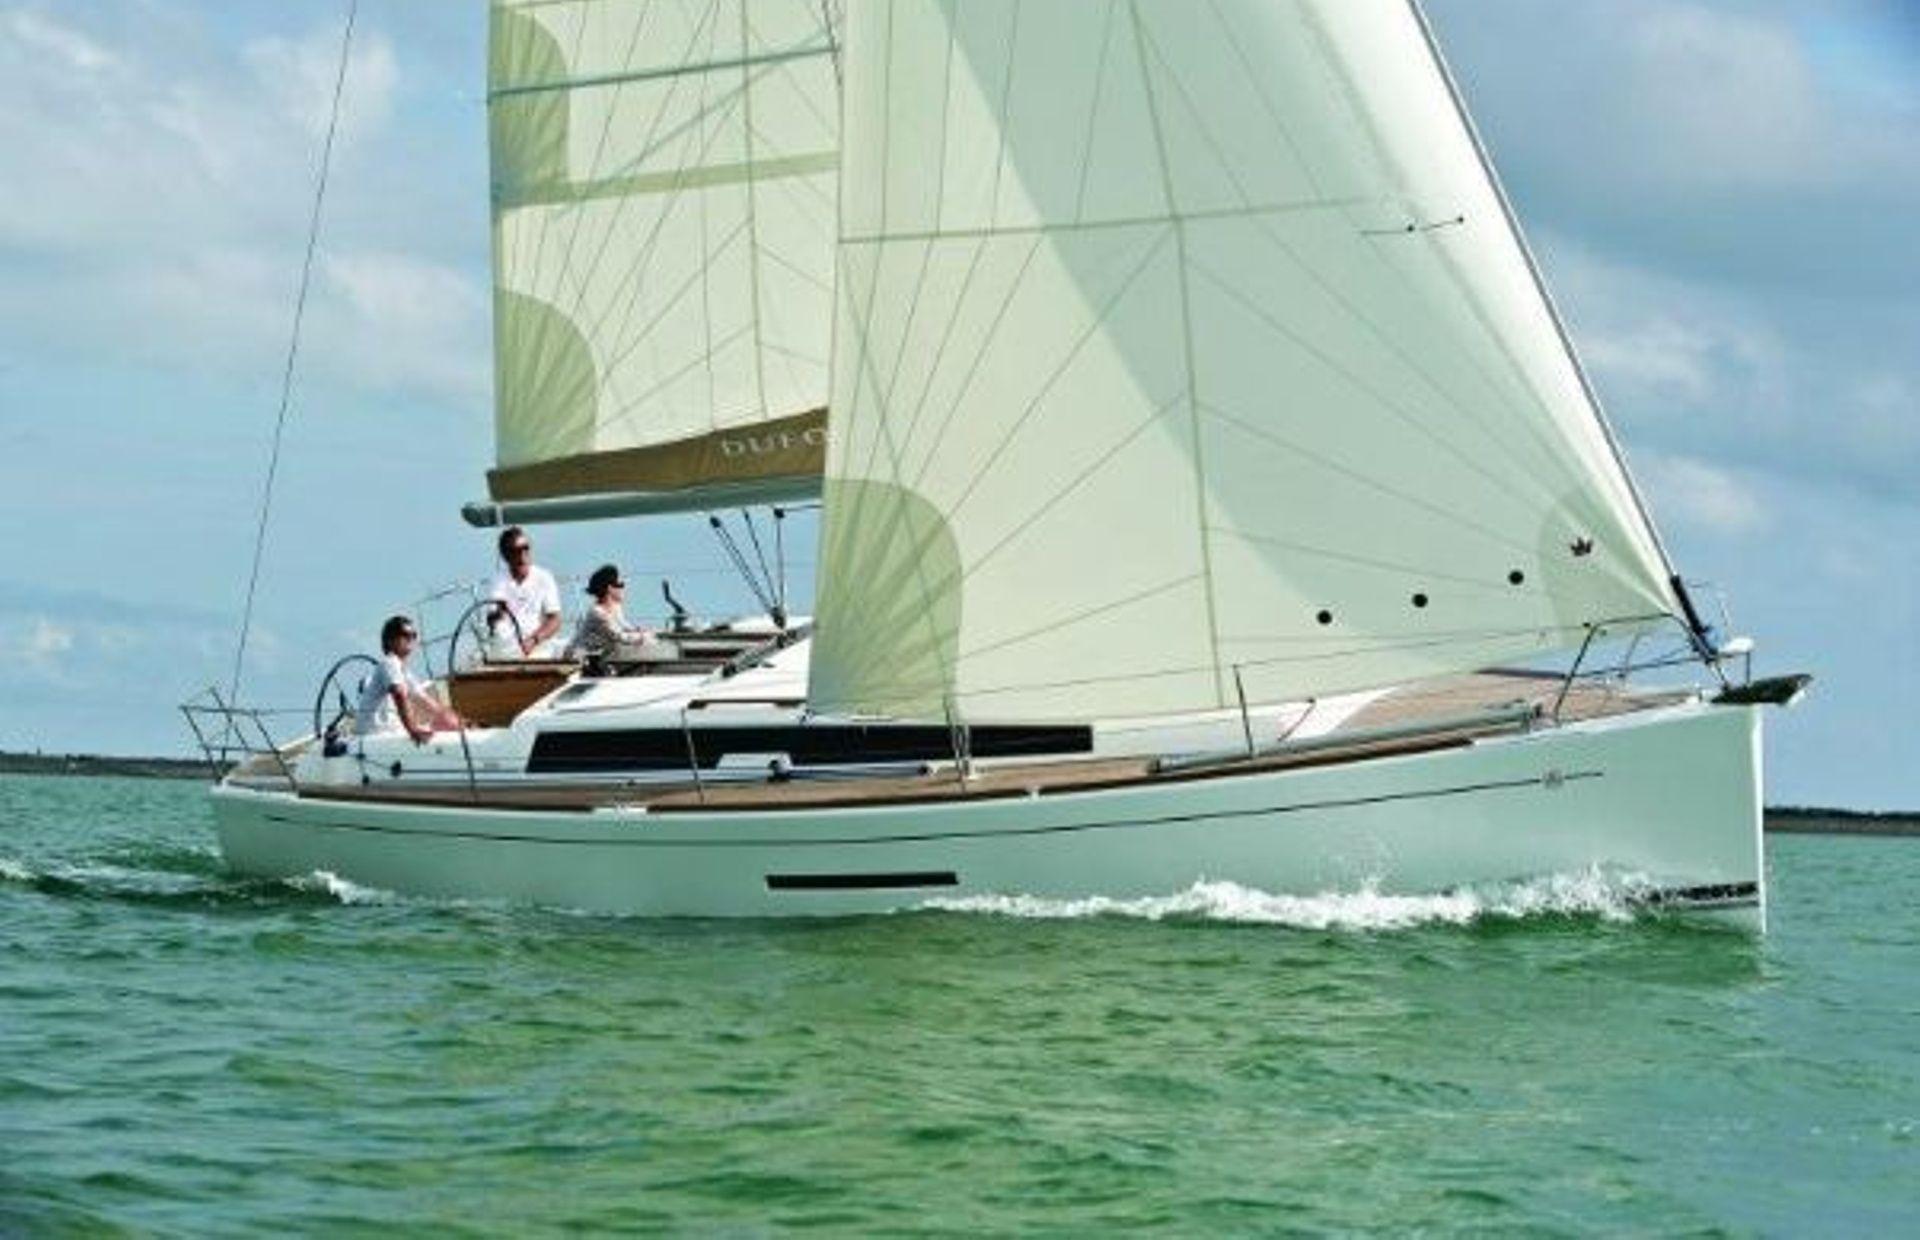 https://media.insailing.com/boat/dufour/image_1563876371580.jpg